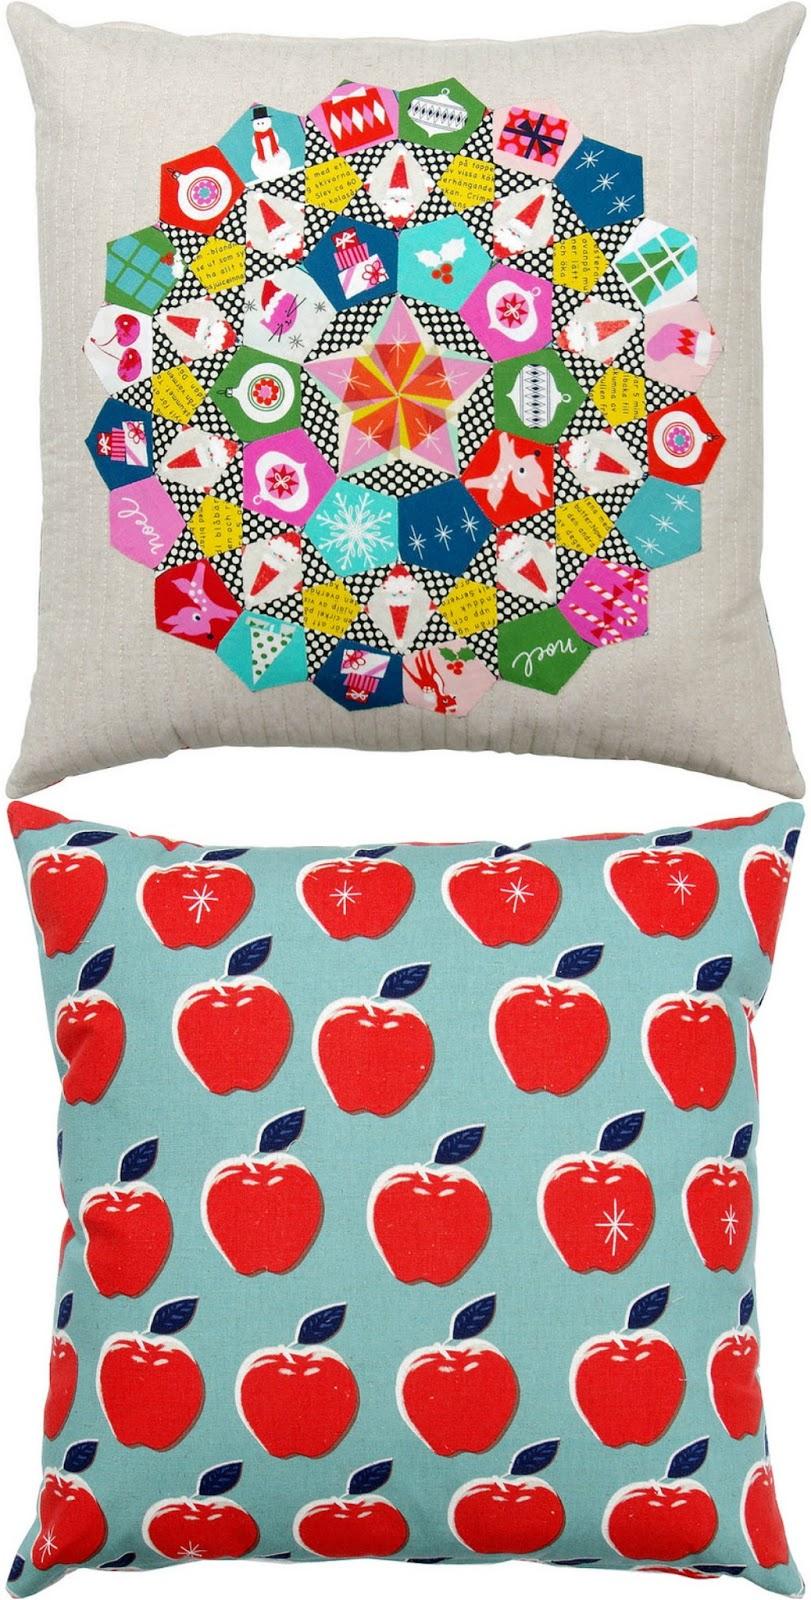 A Handmade Christmas - Garland Pillow Cover | © Red Pepper Quilts 2016